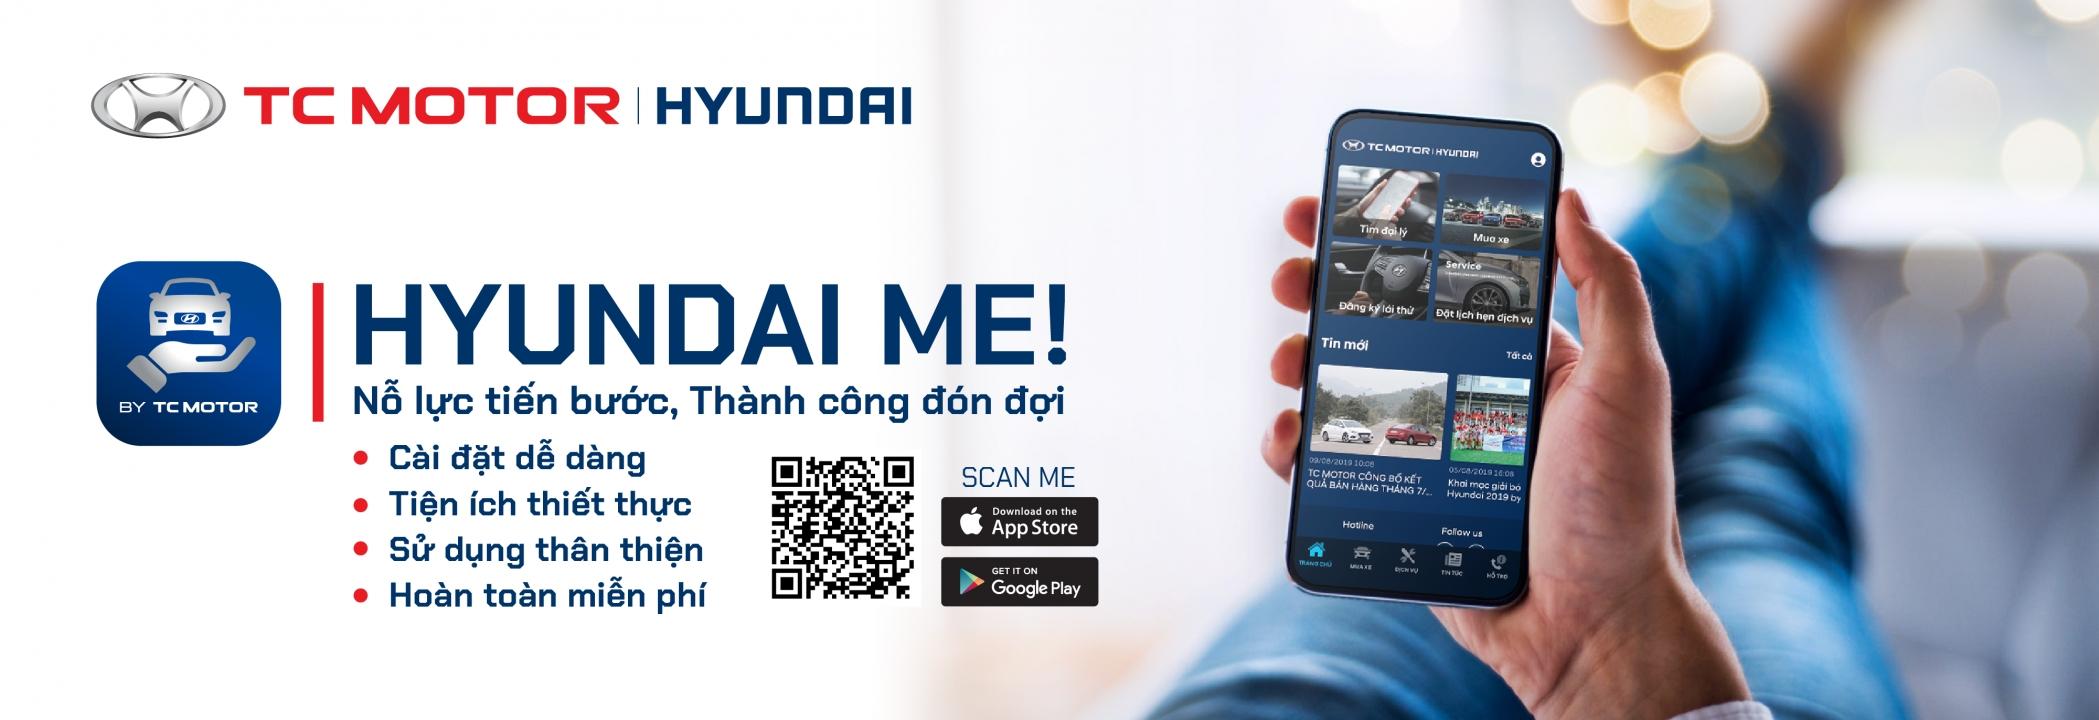 Hyundai ME!